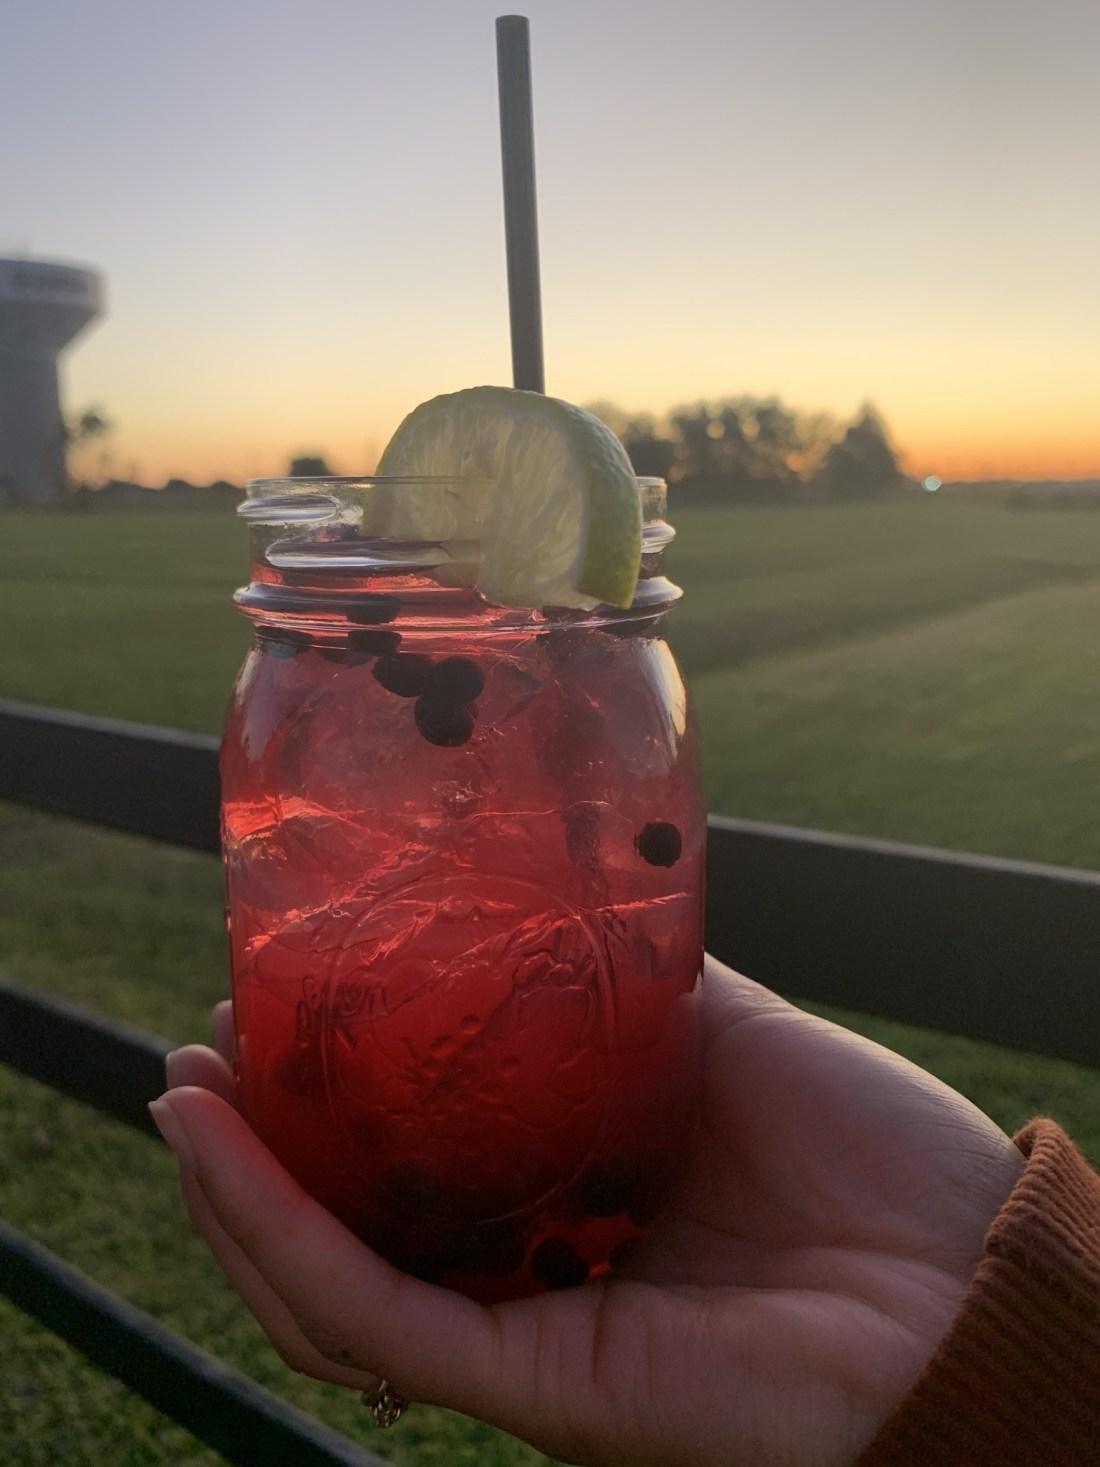 Drink in mason jar